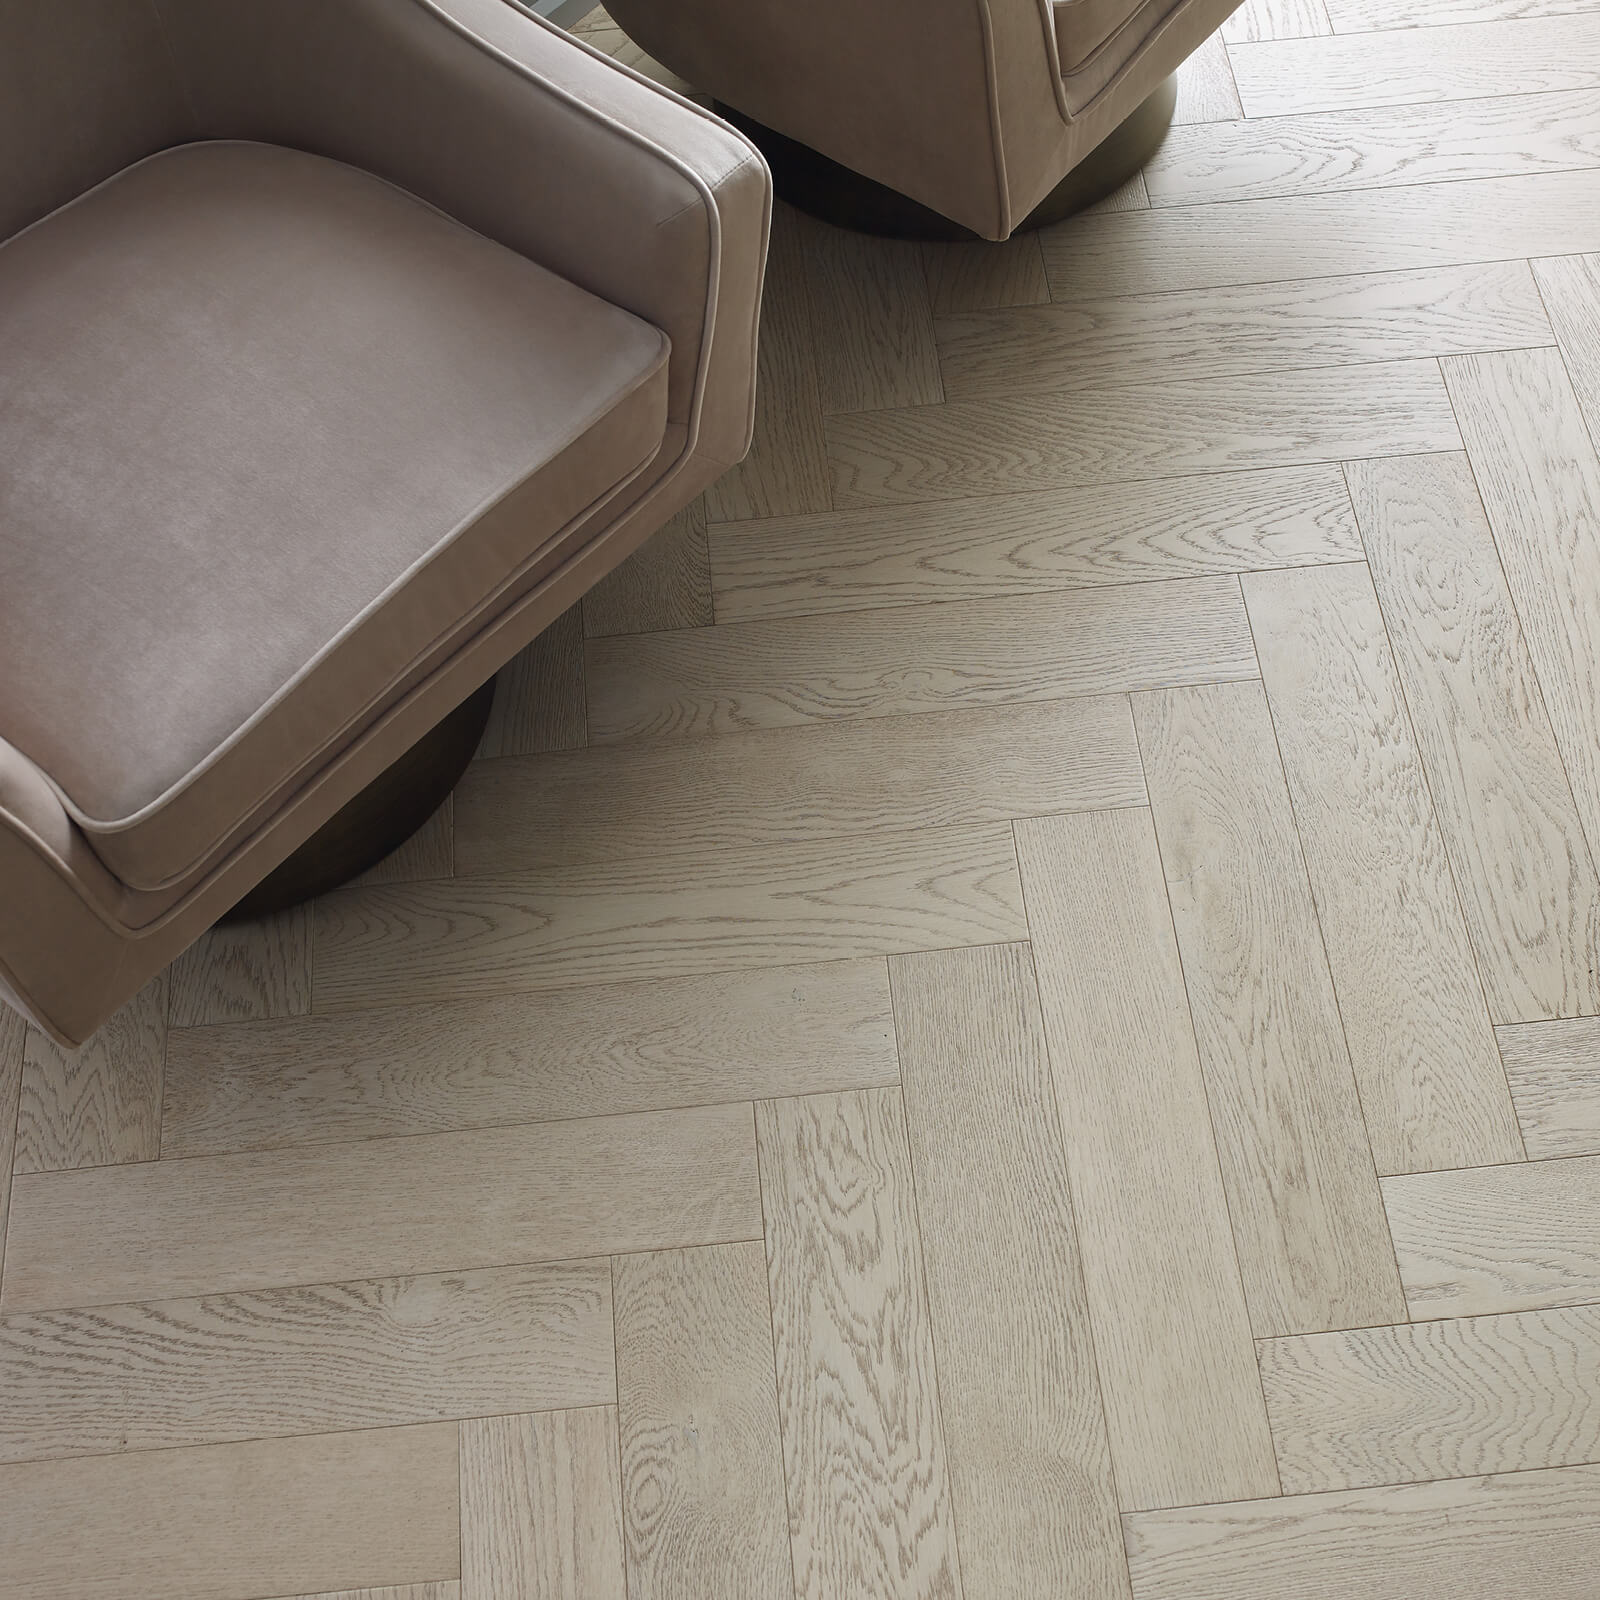 Fifth avenue oak flooring | McSwain Carpet & Floors